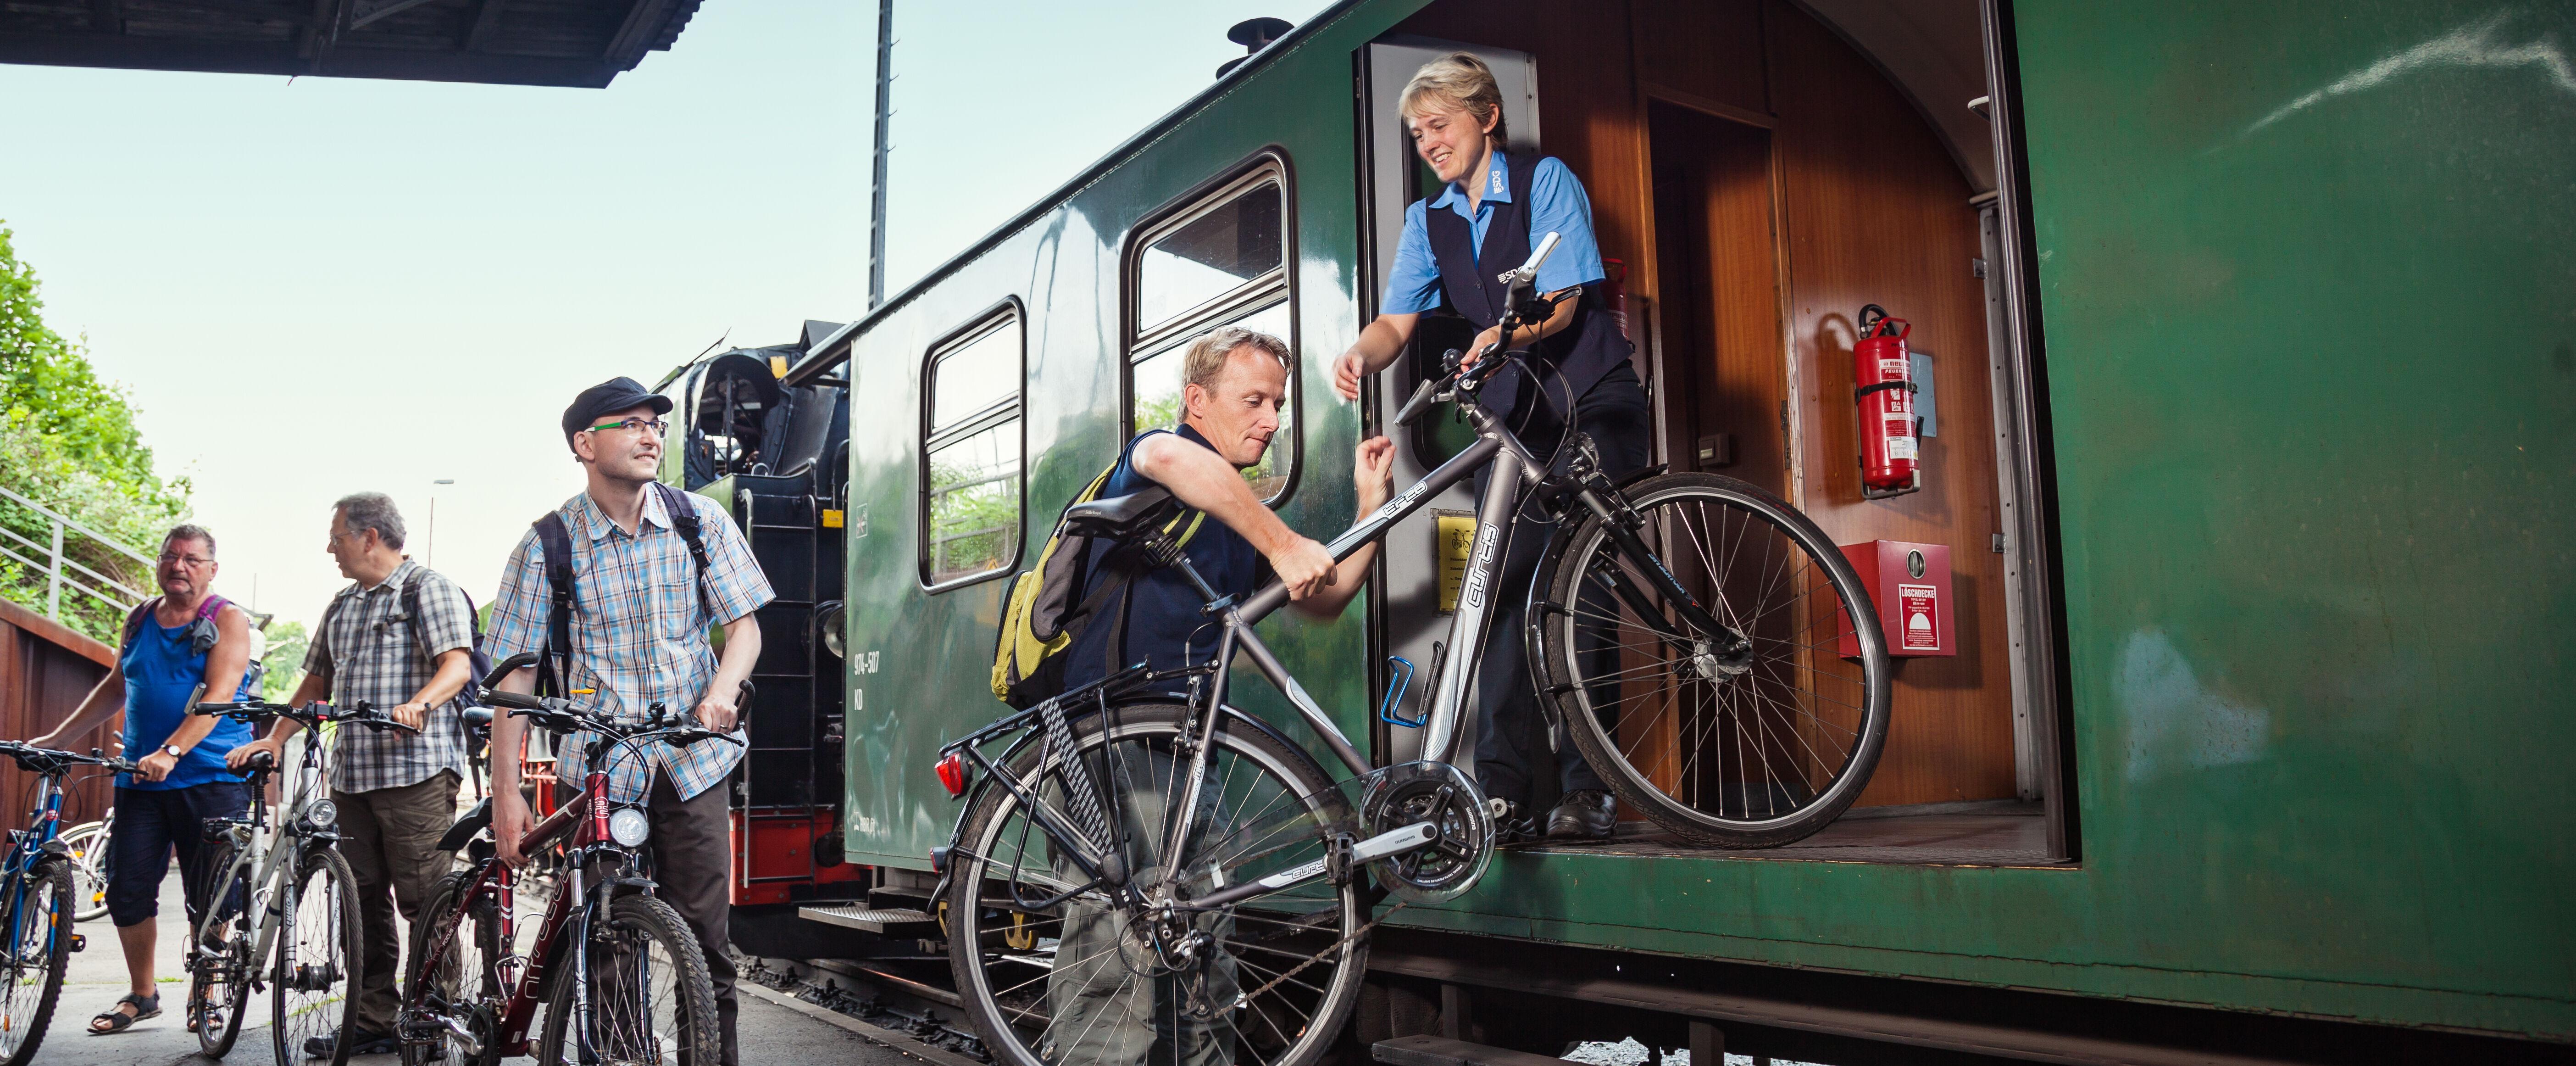 Fahrradmitnahme - kein Problem